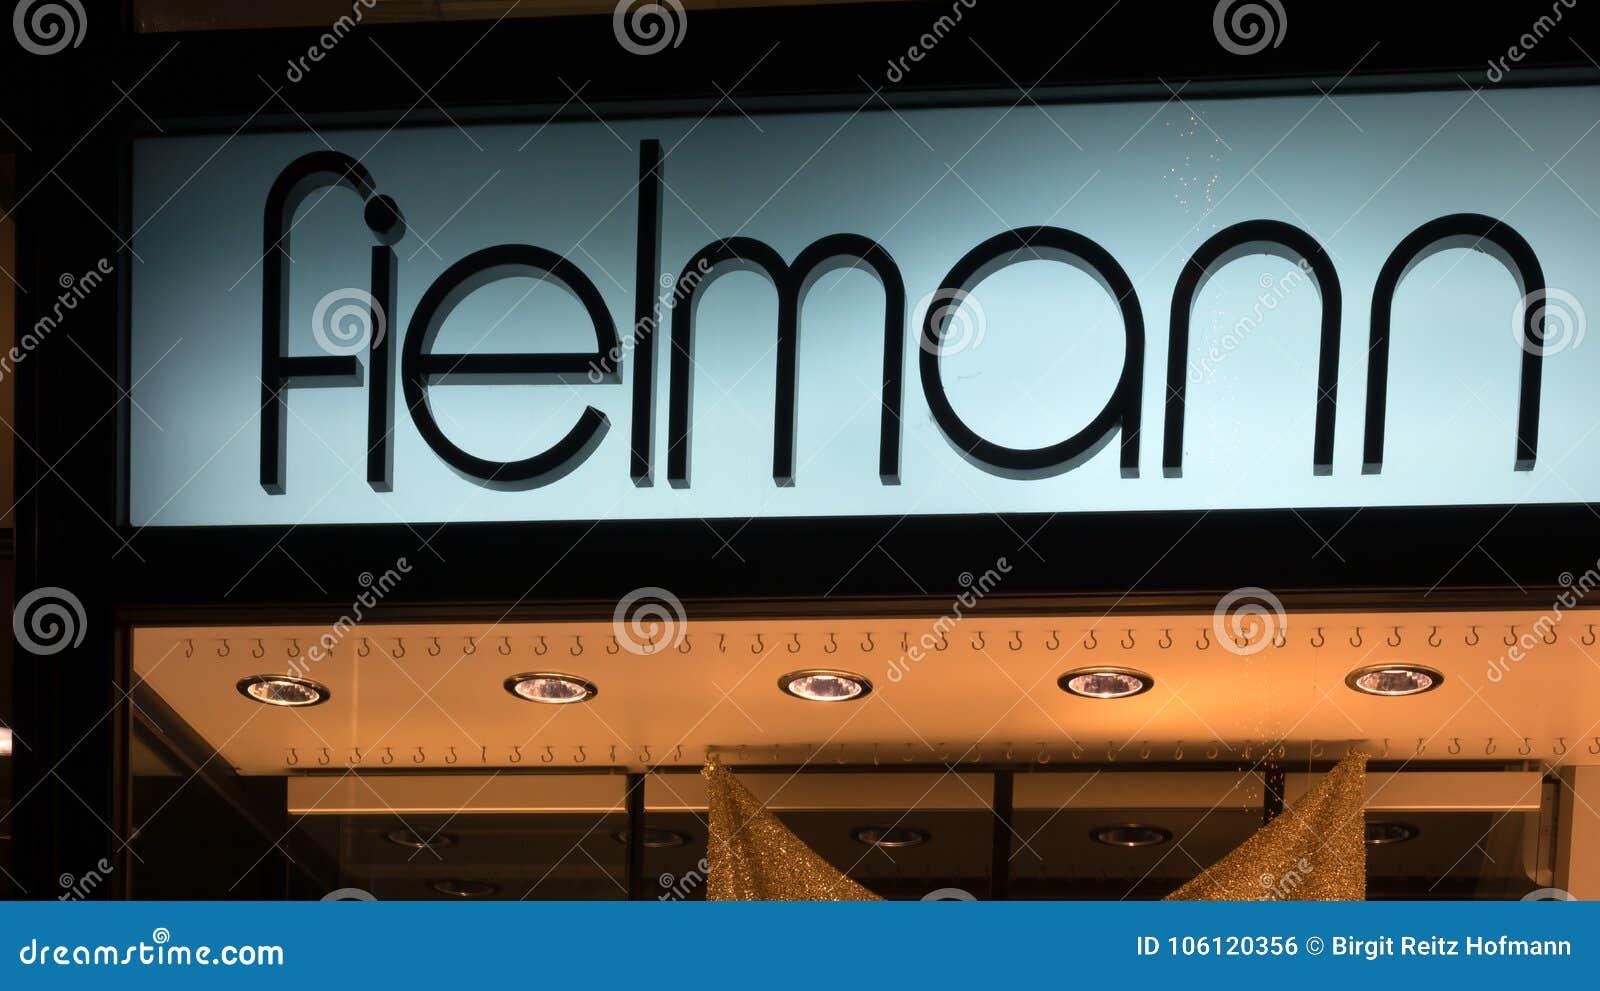 Загоренный логотип FIELMANN